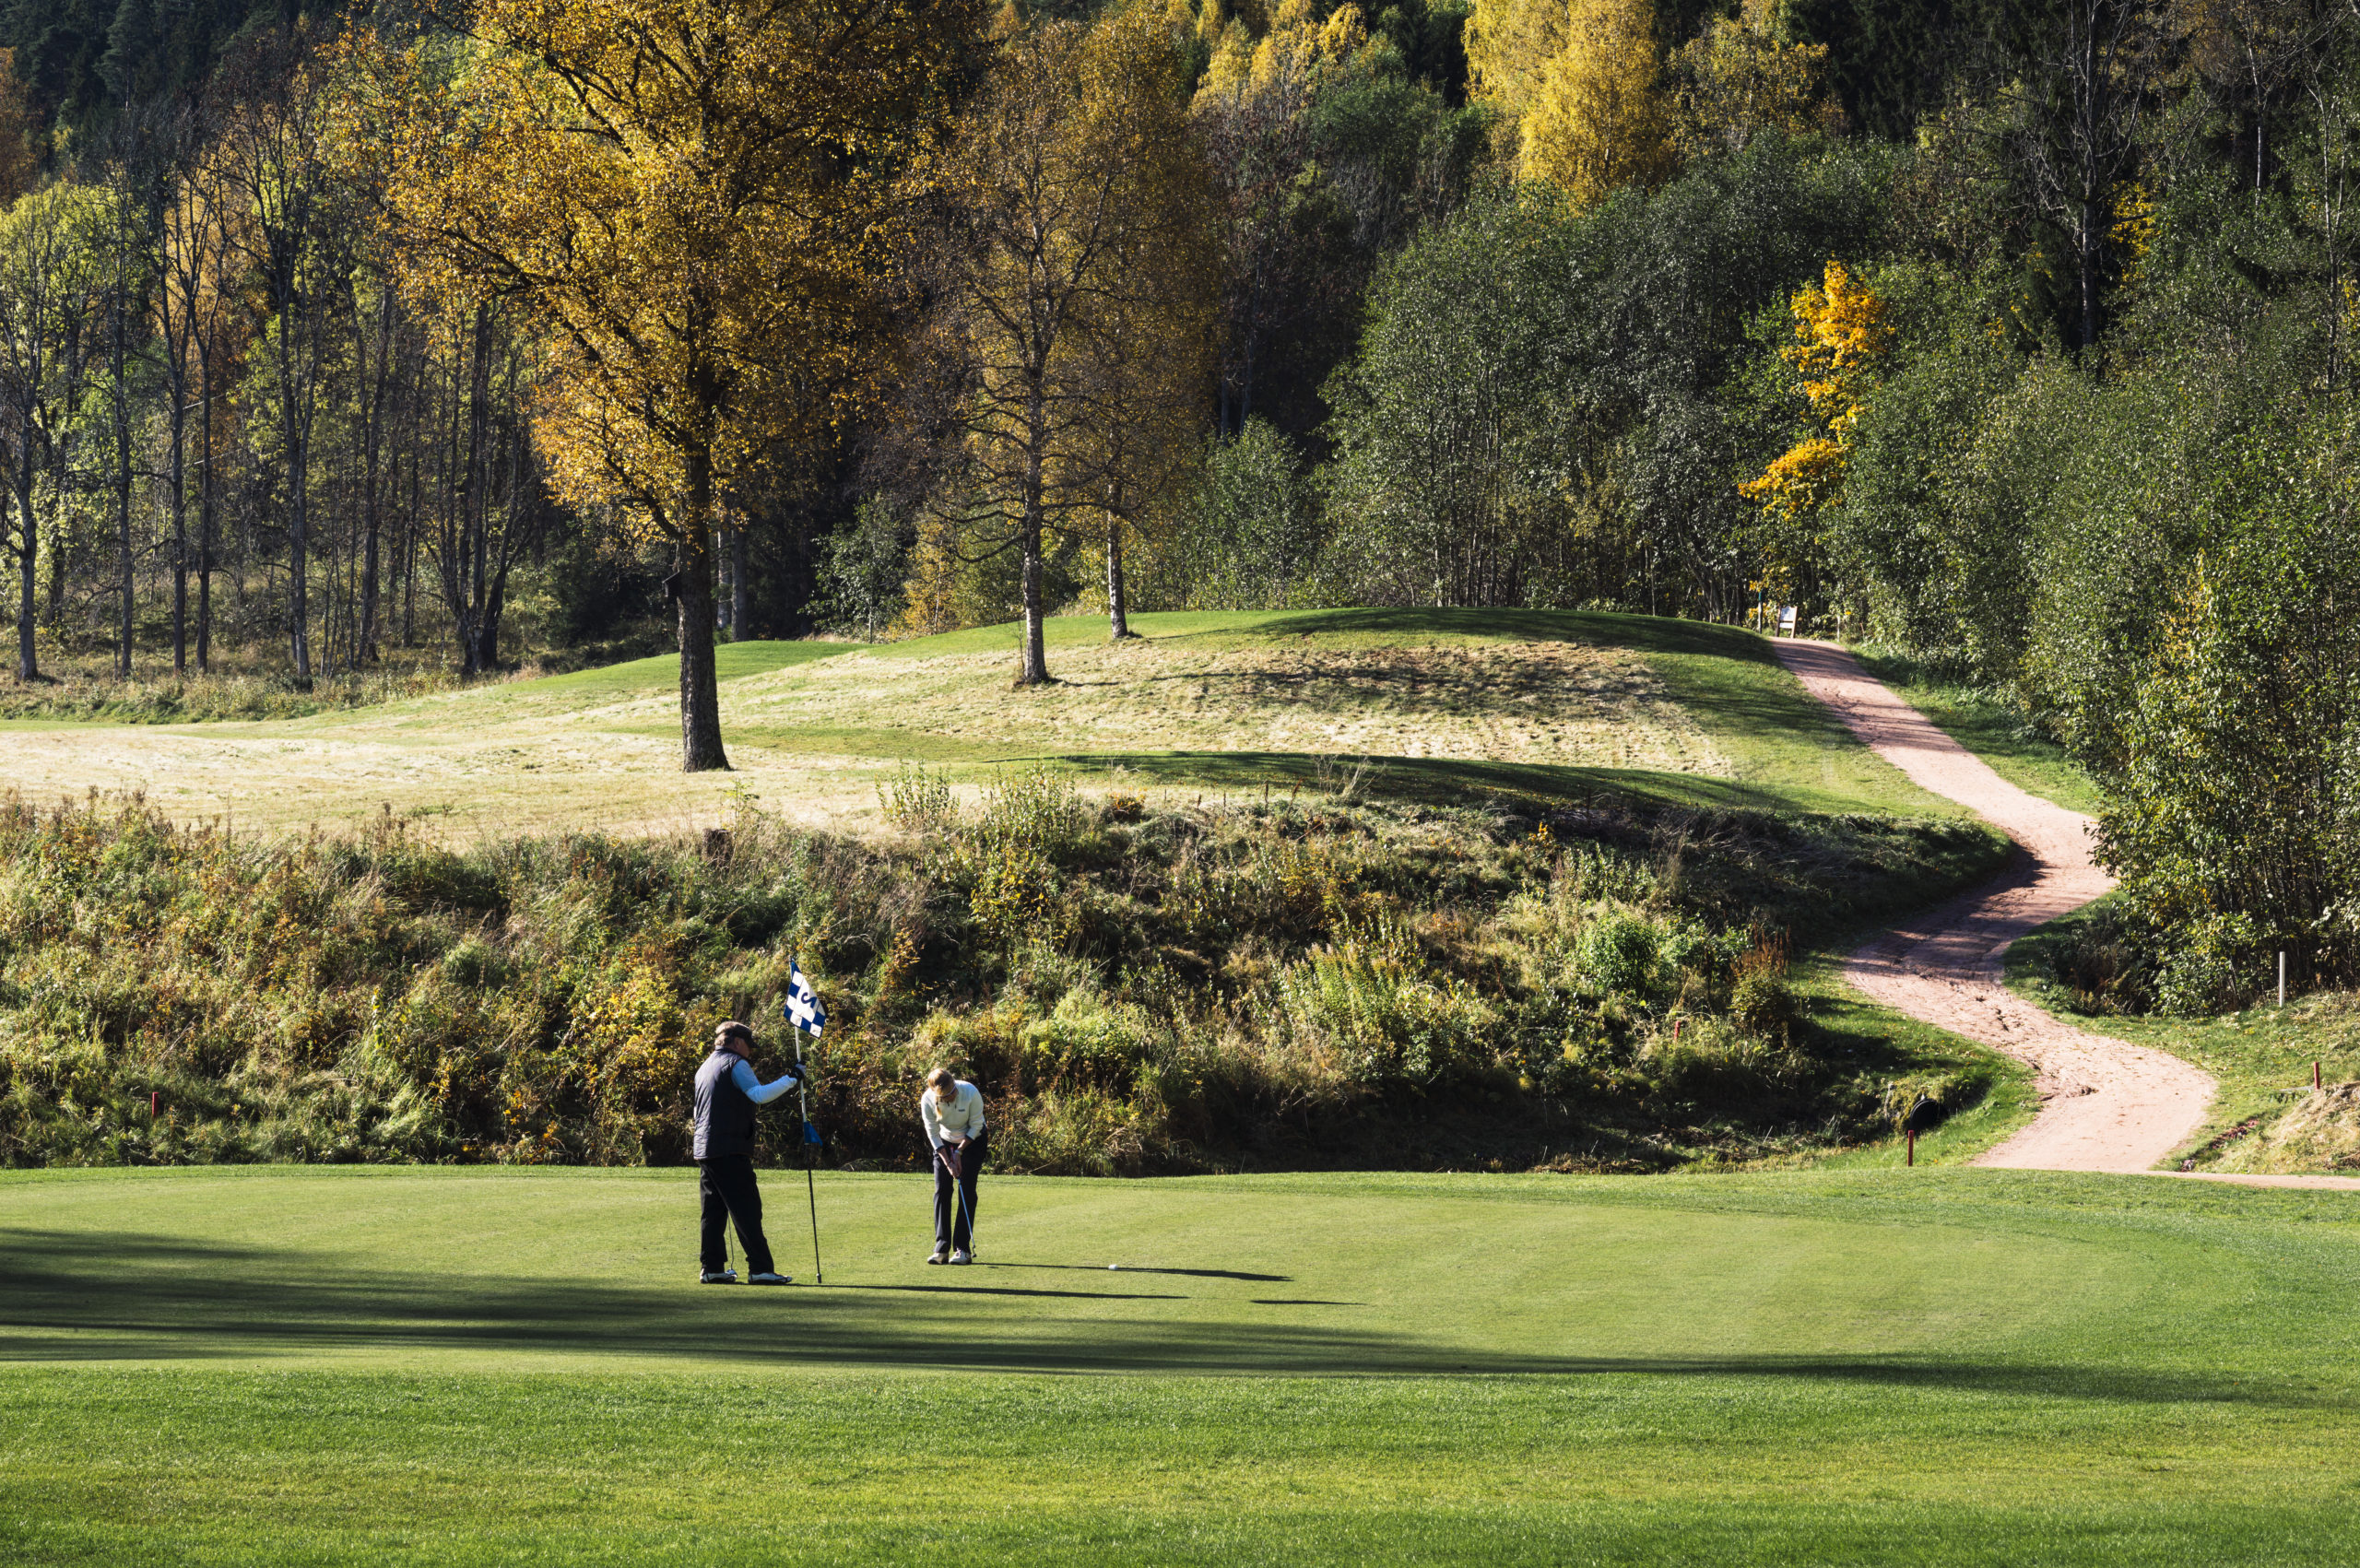 Haga Golfpark